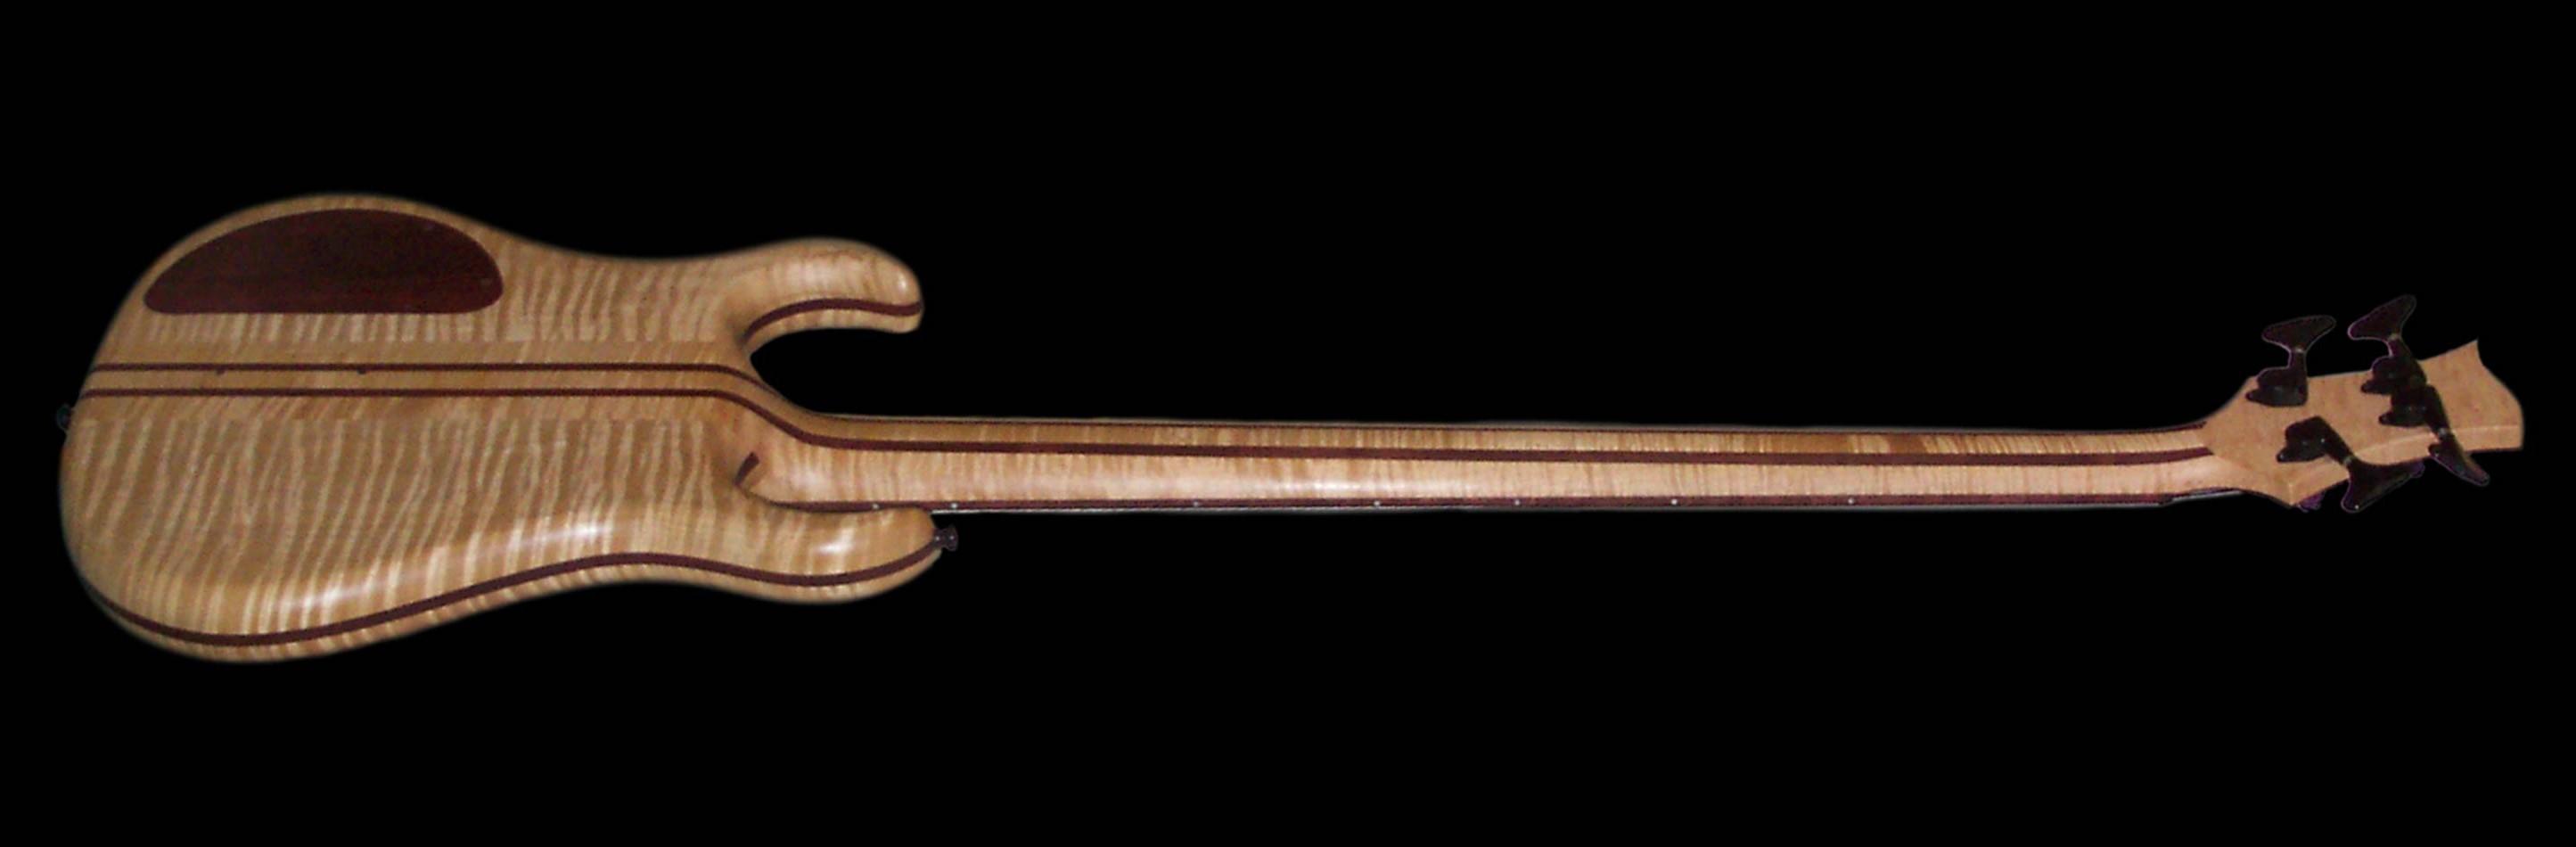 Bass-4w